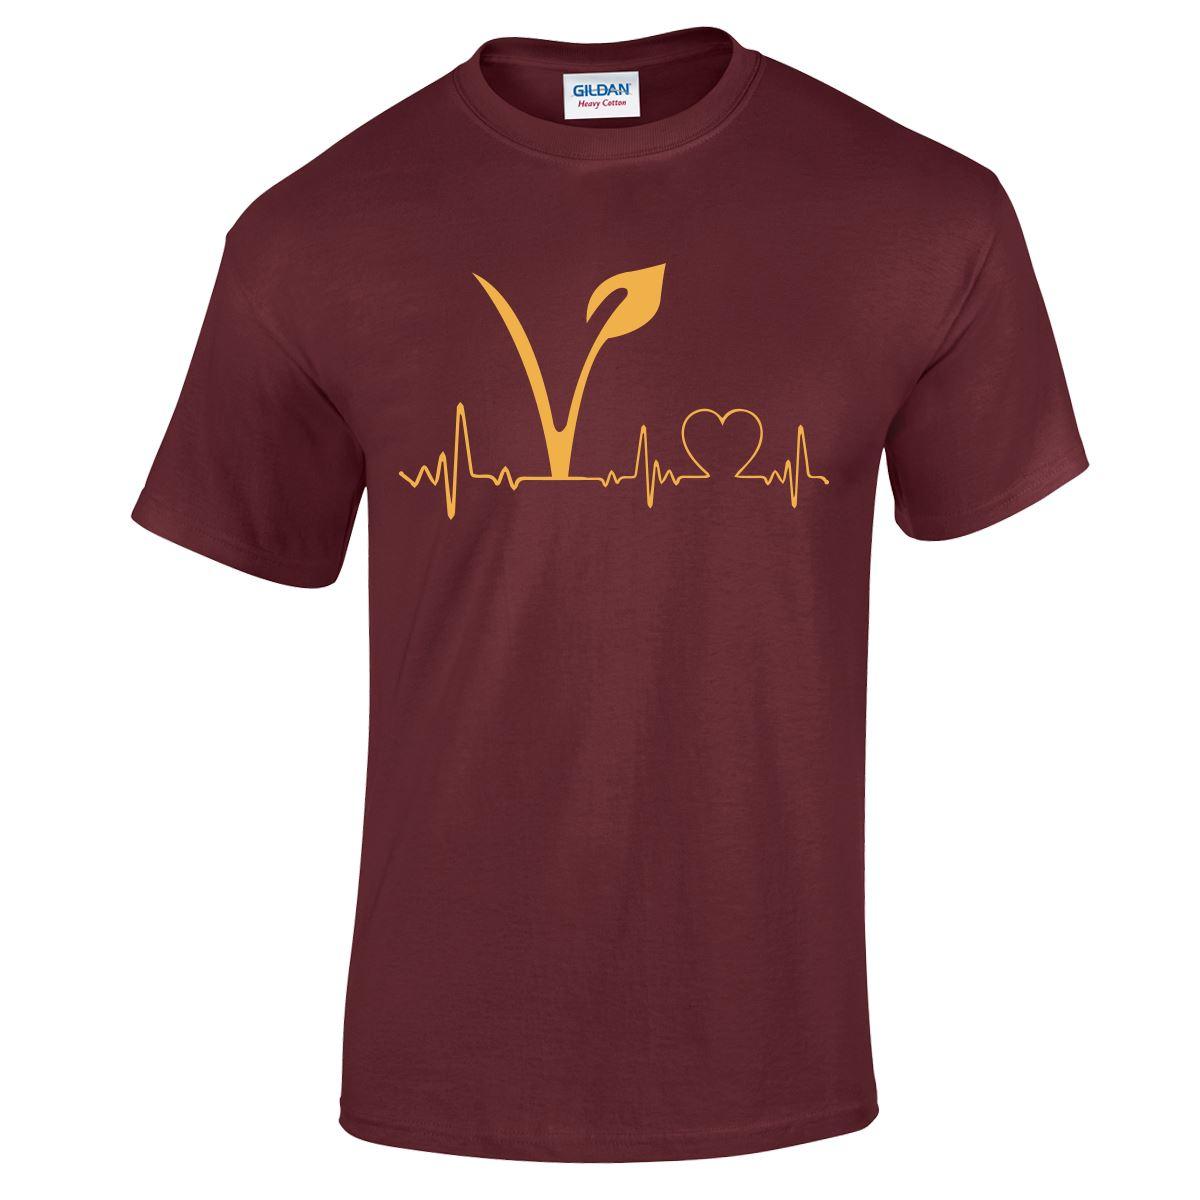 Vegetarian Vegan Hipster Heart Top Xmas TEE Tumblr Lifeline Youth Mens T Shirt